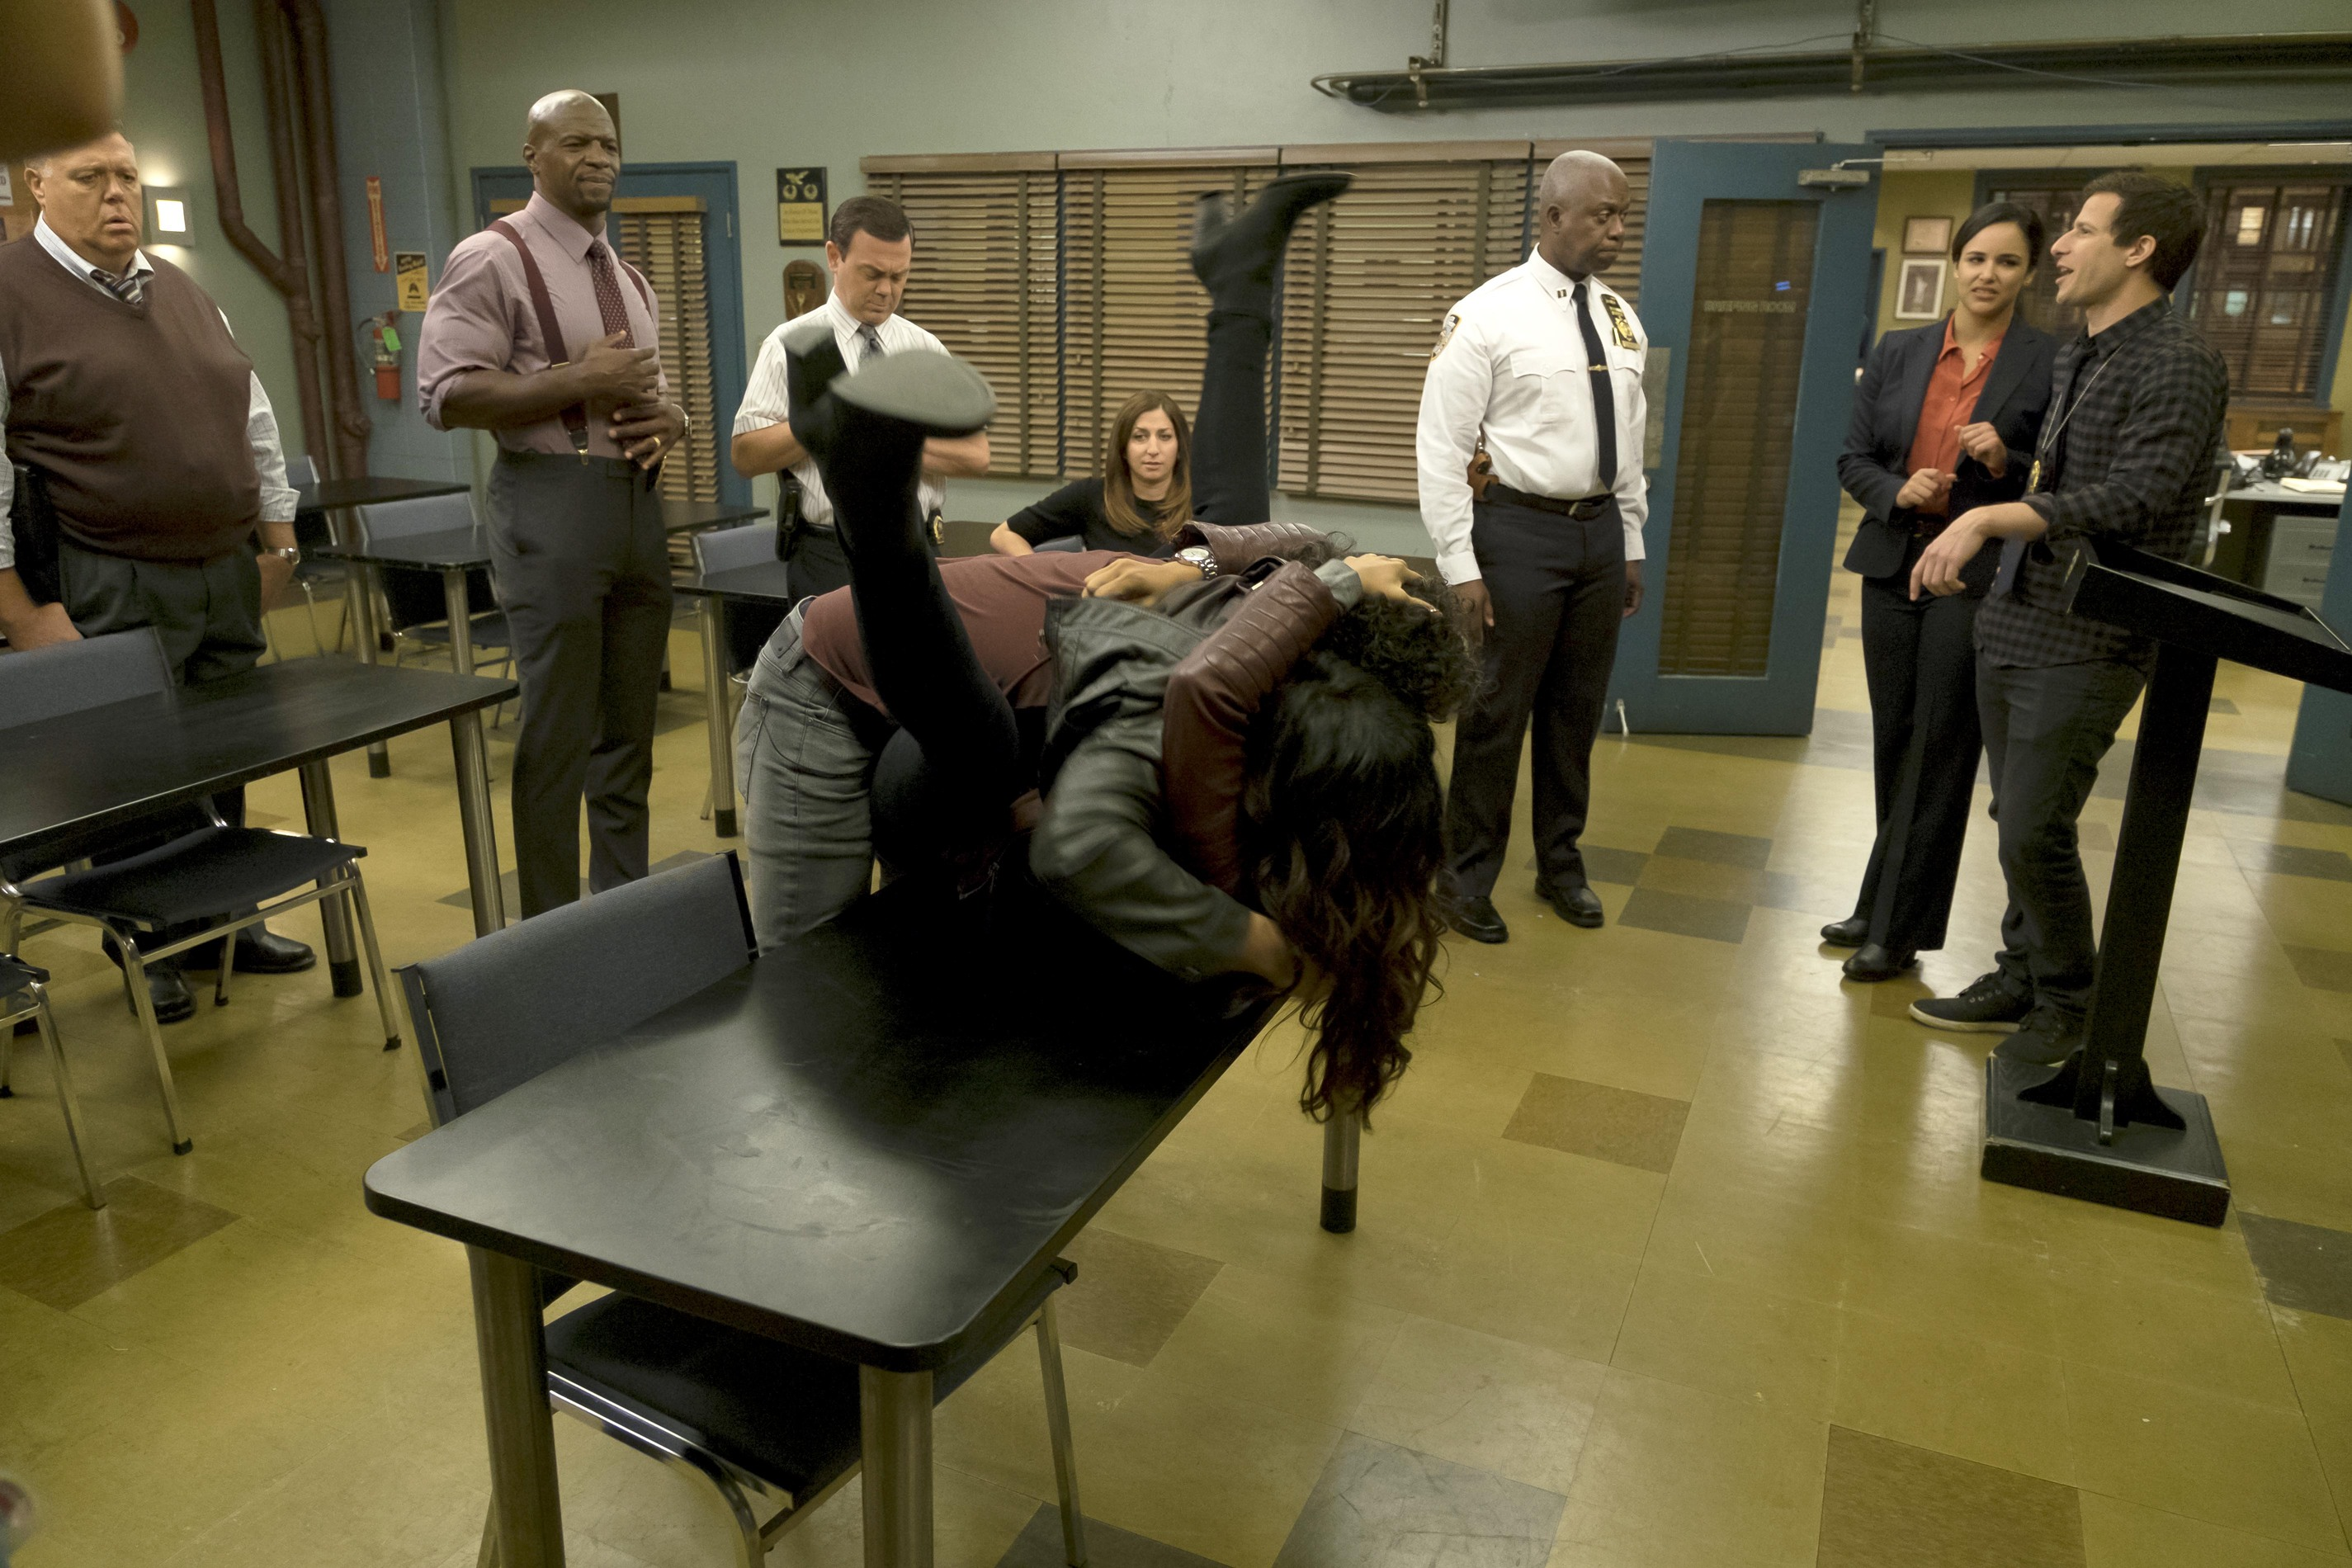 Brooklyn Nine-Nine: Mr. Santiago | Season 4 | Episode 7